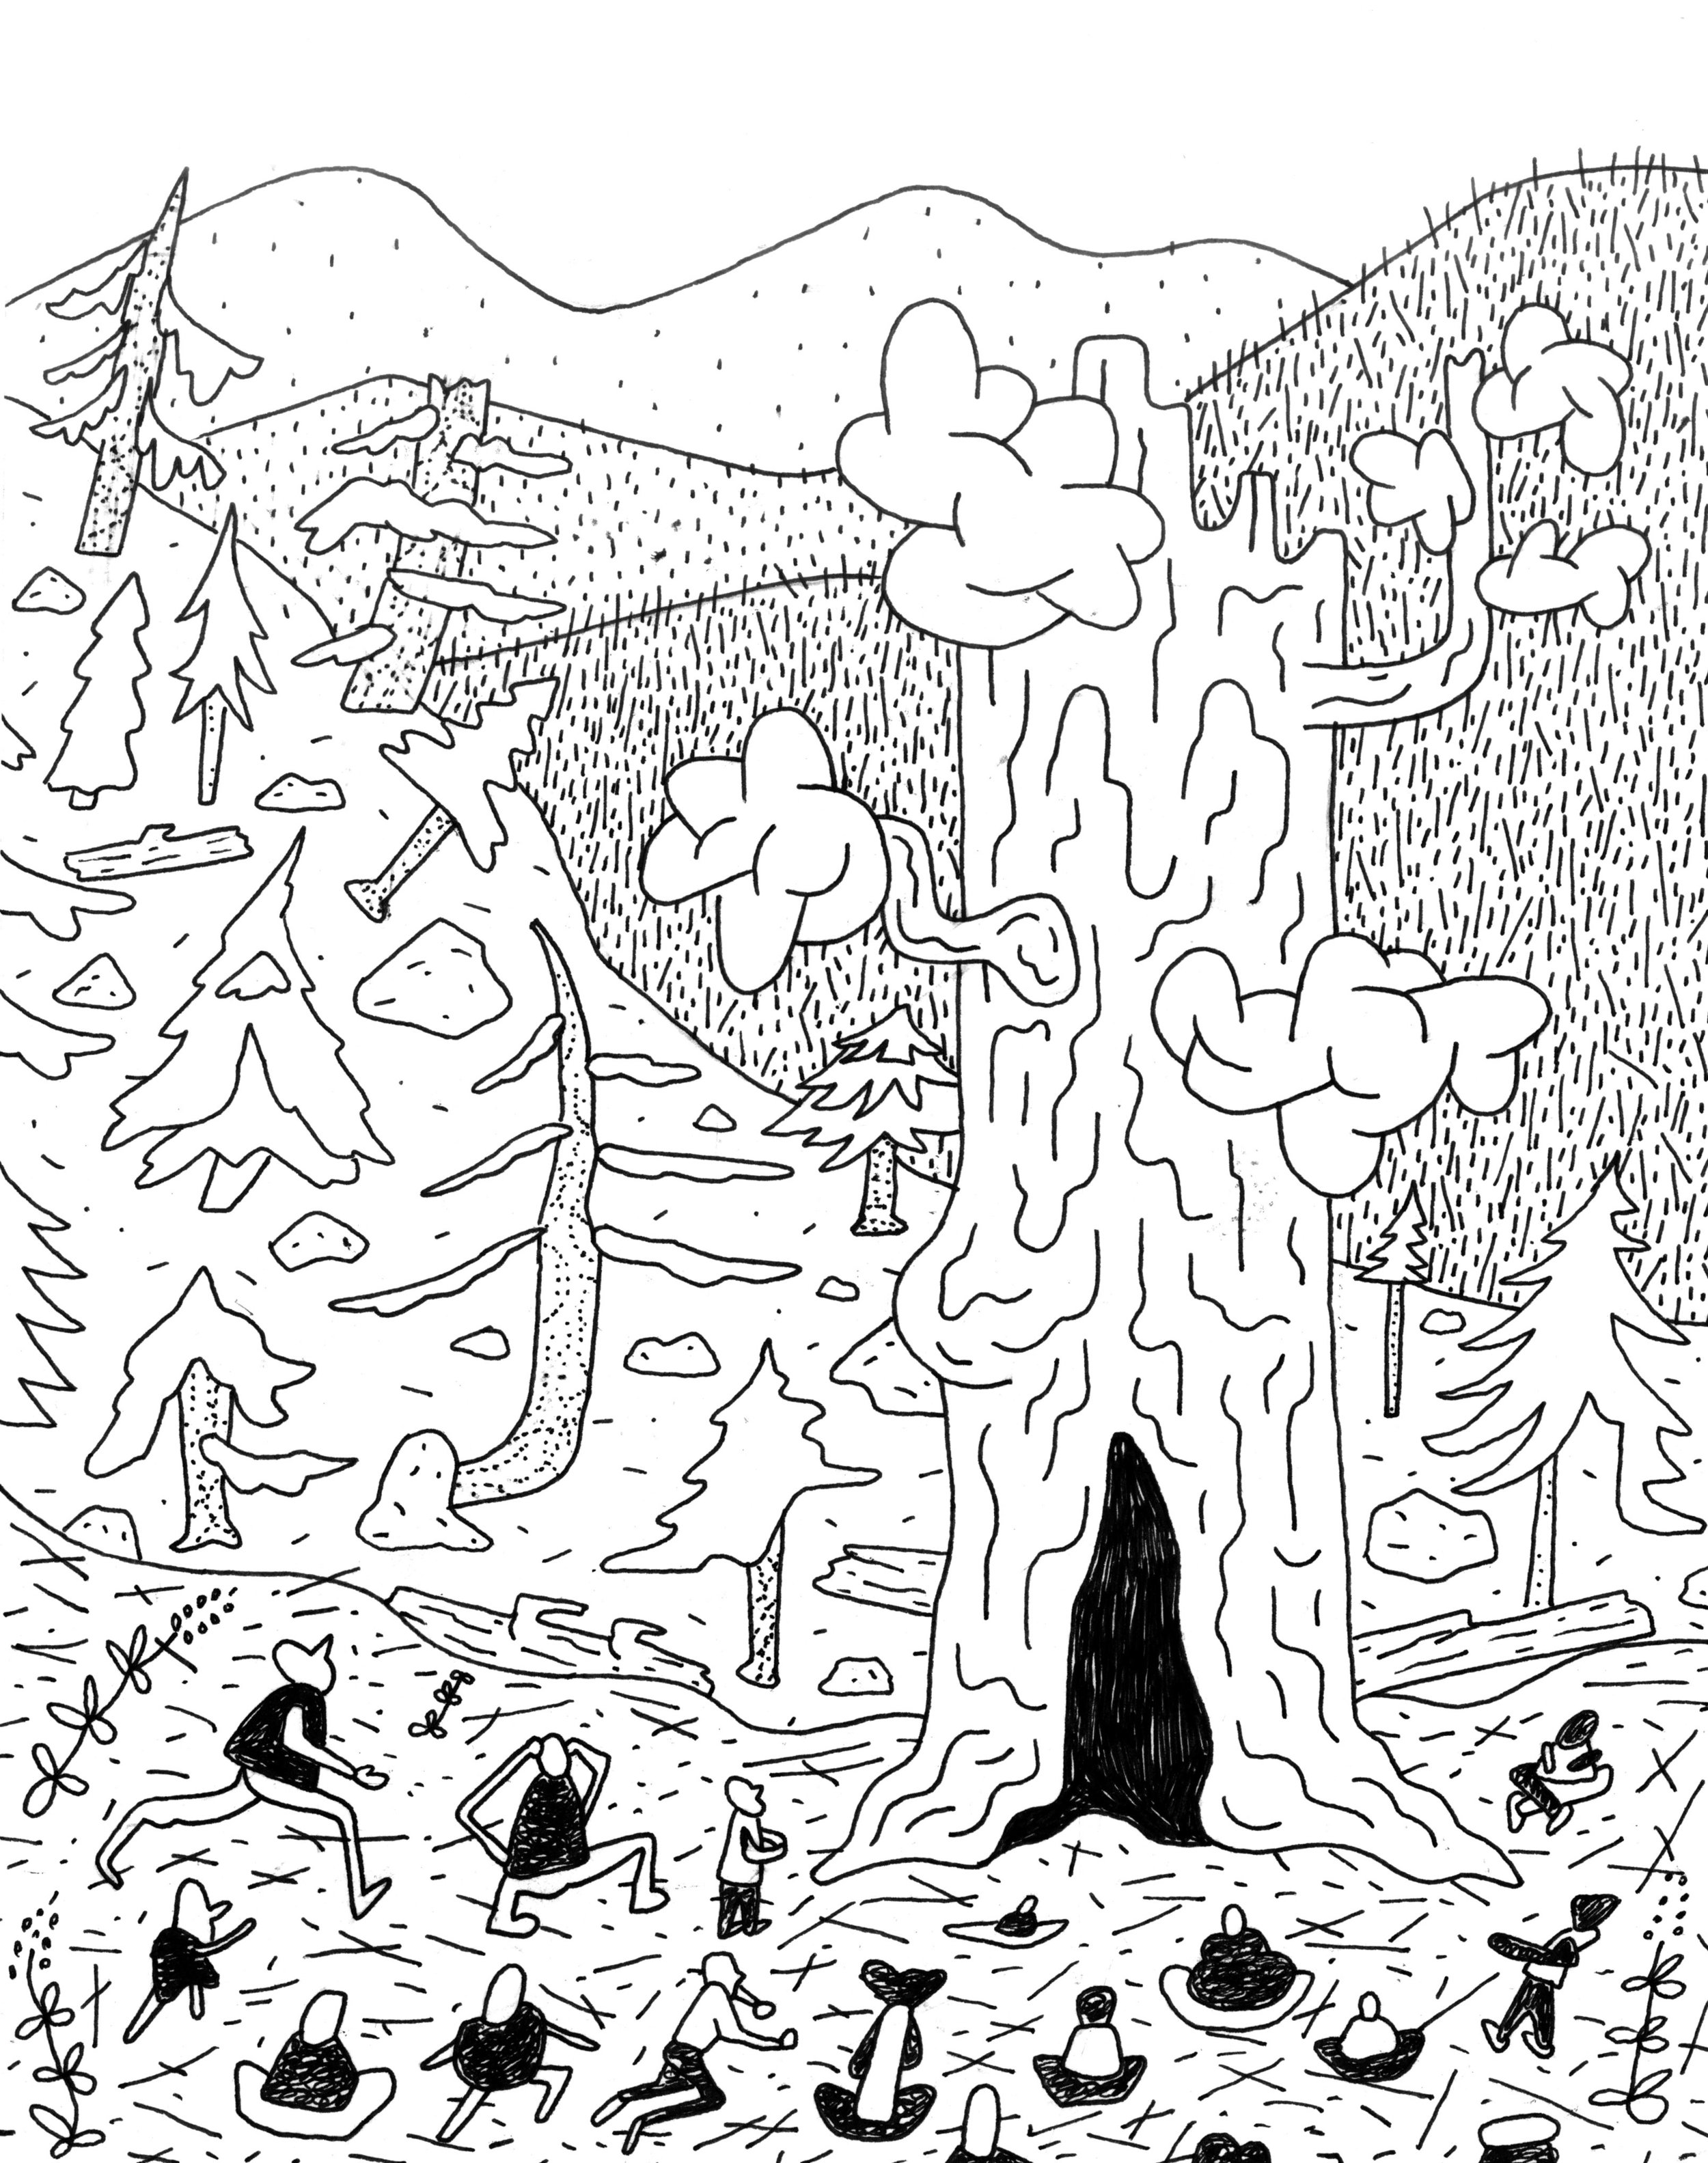 Sequoia-god_web_3215.jpg